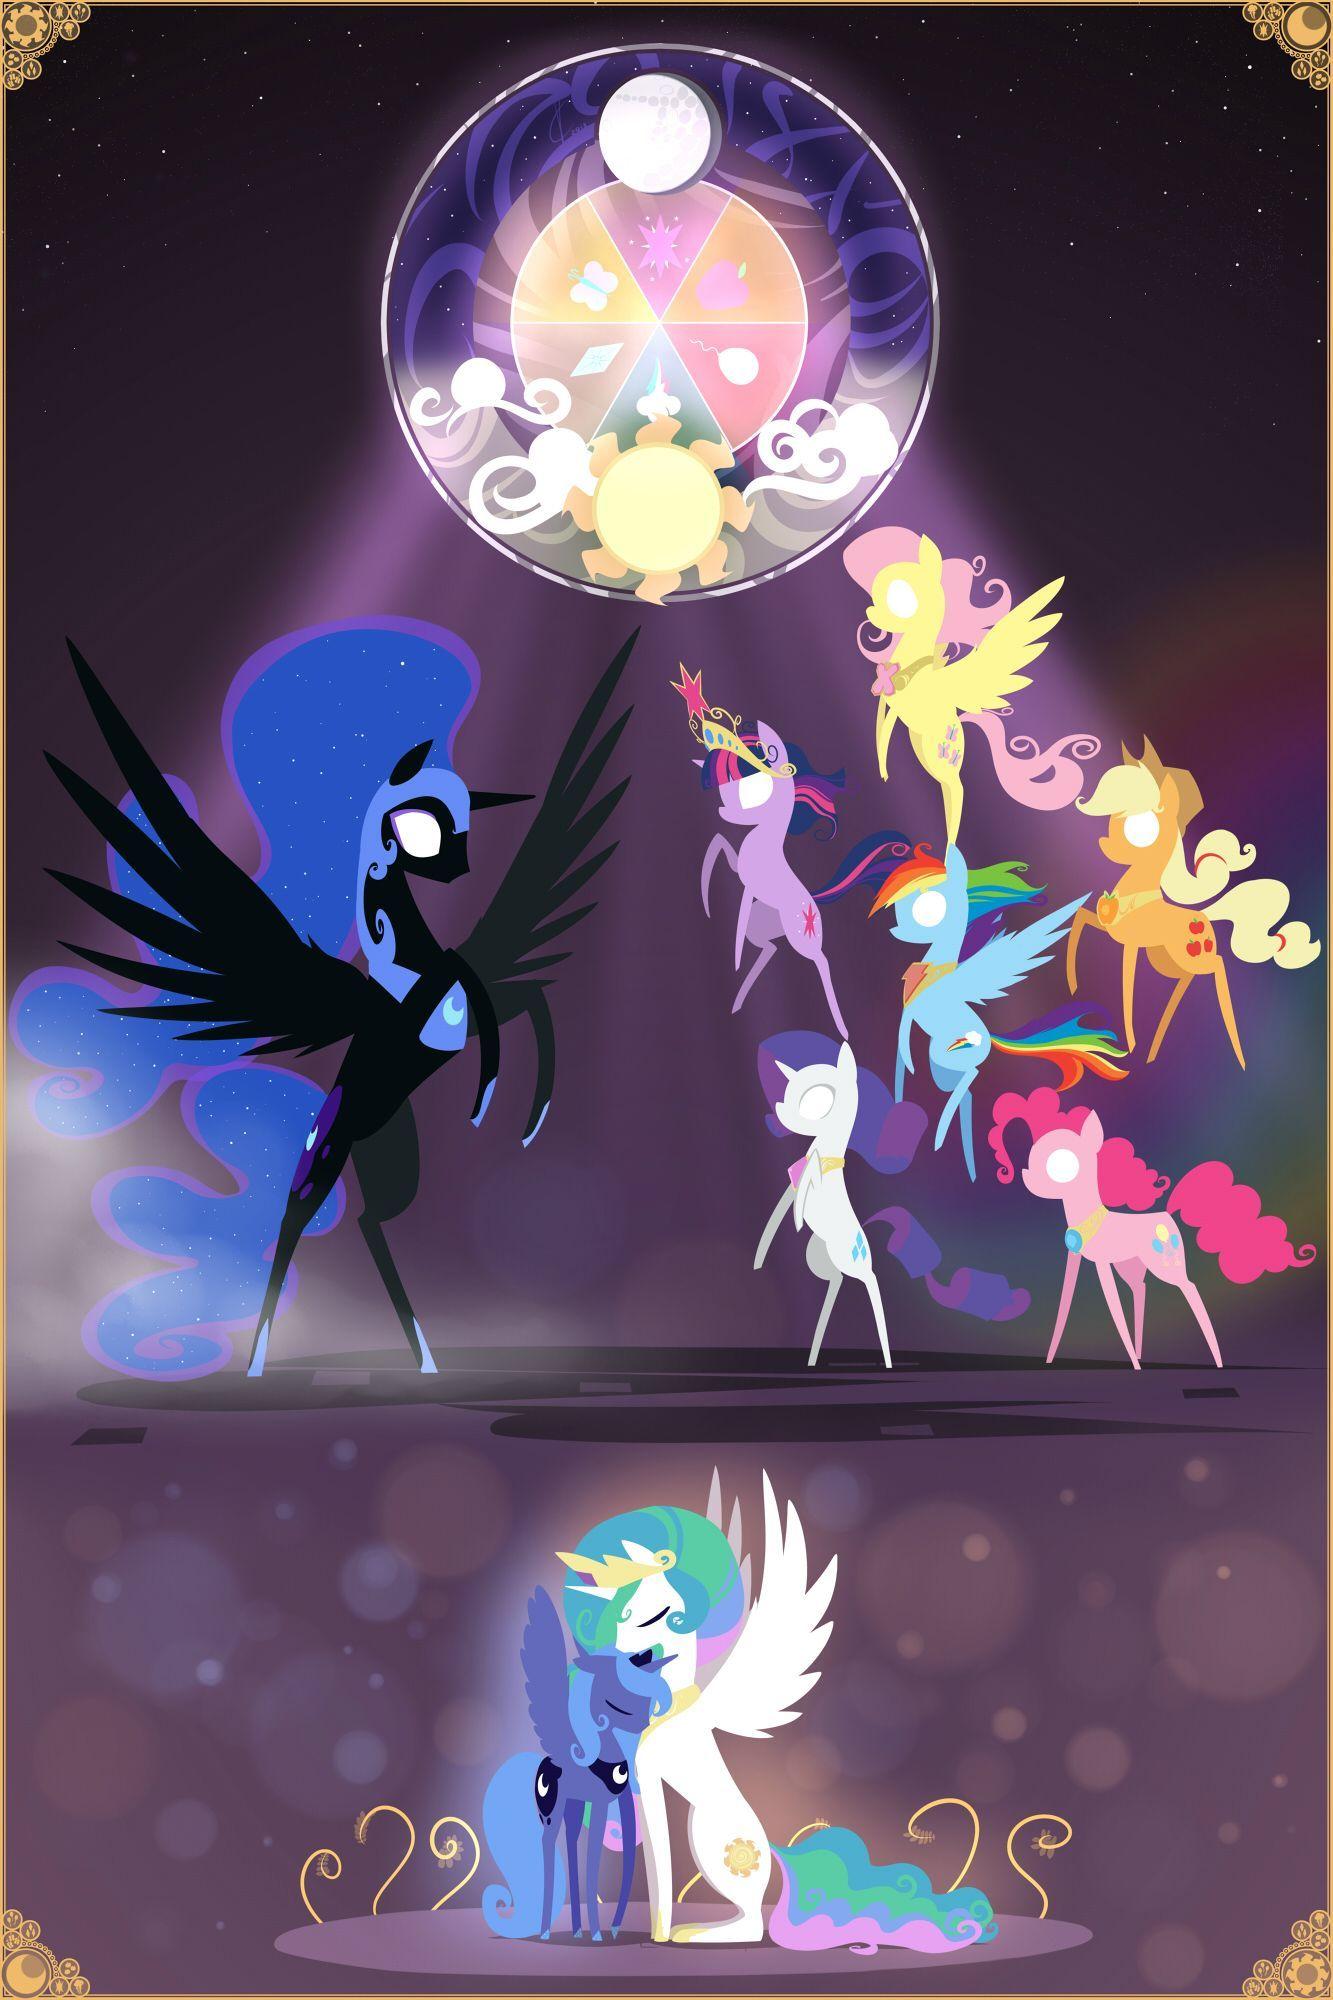 Sisterreunited pony princesse luna jument et dessin anim - Pony dessin anime ...